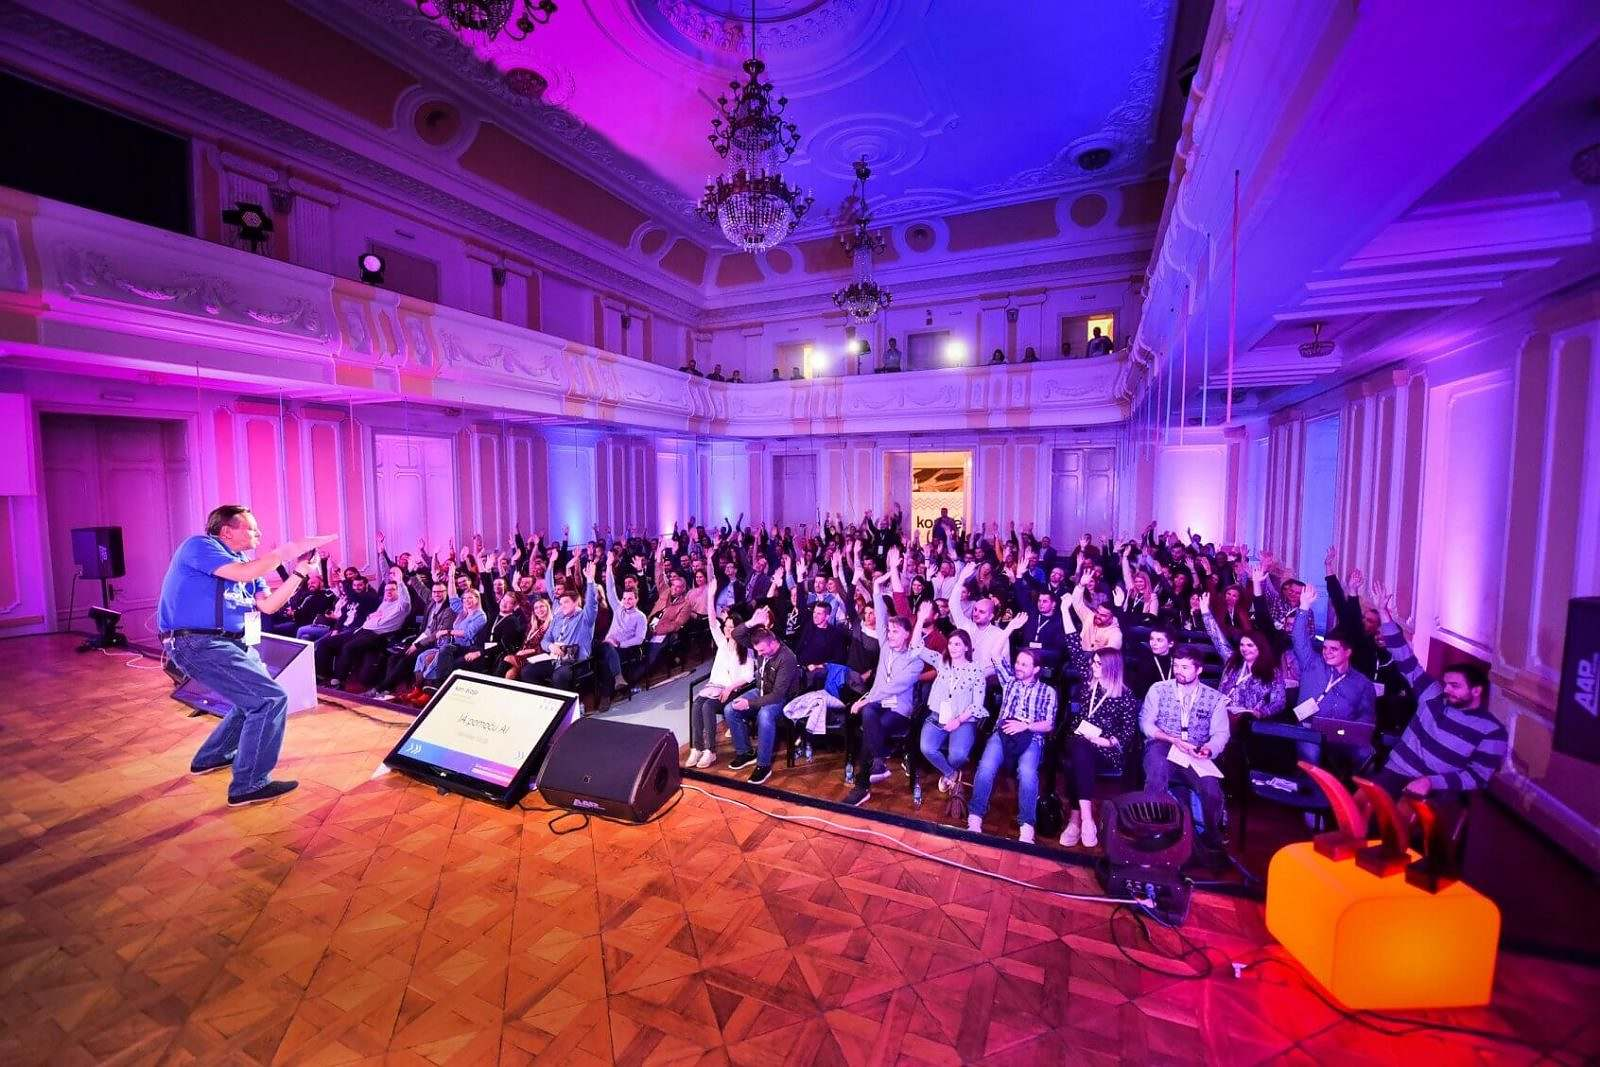 keynote speaker at Konverzija conference